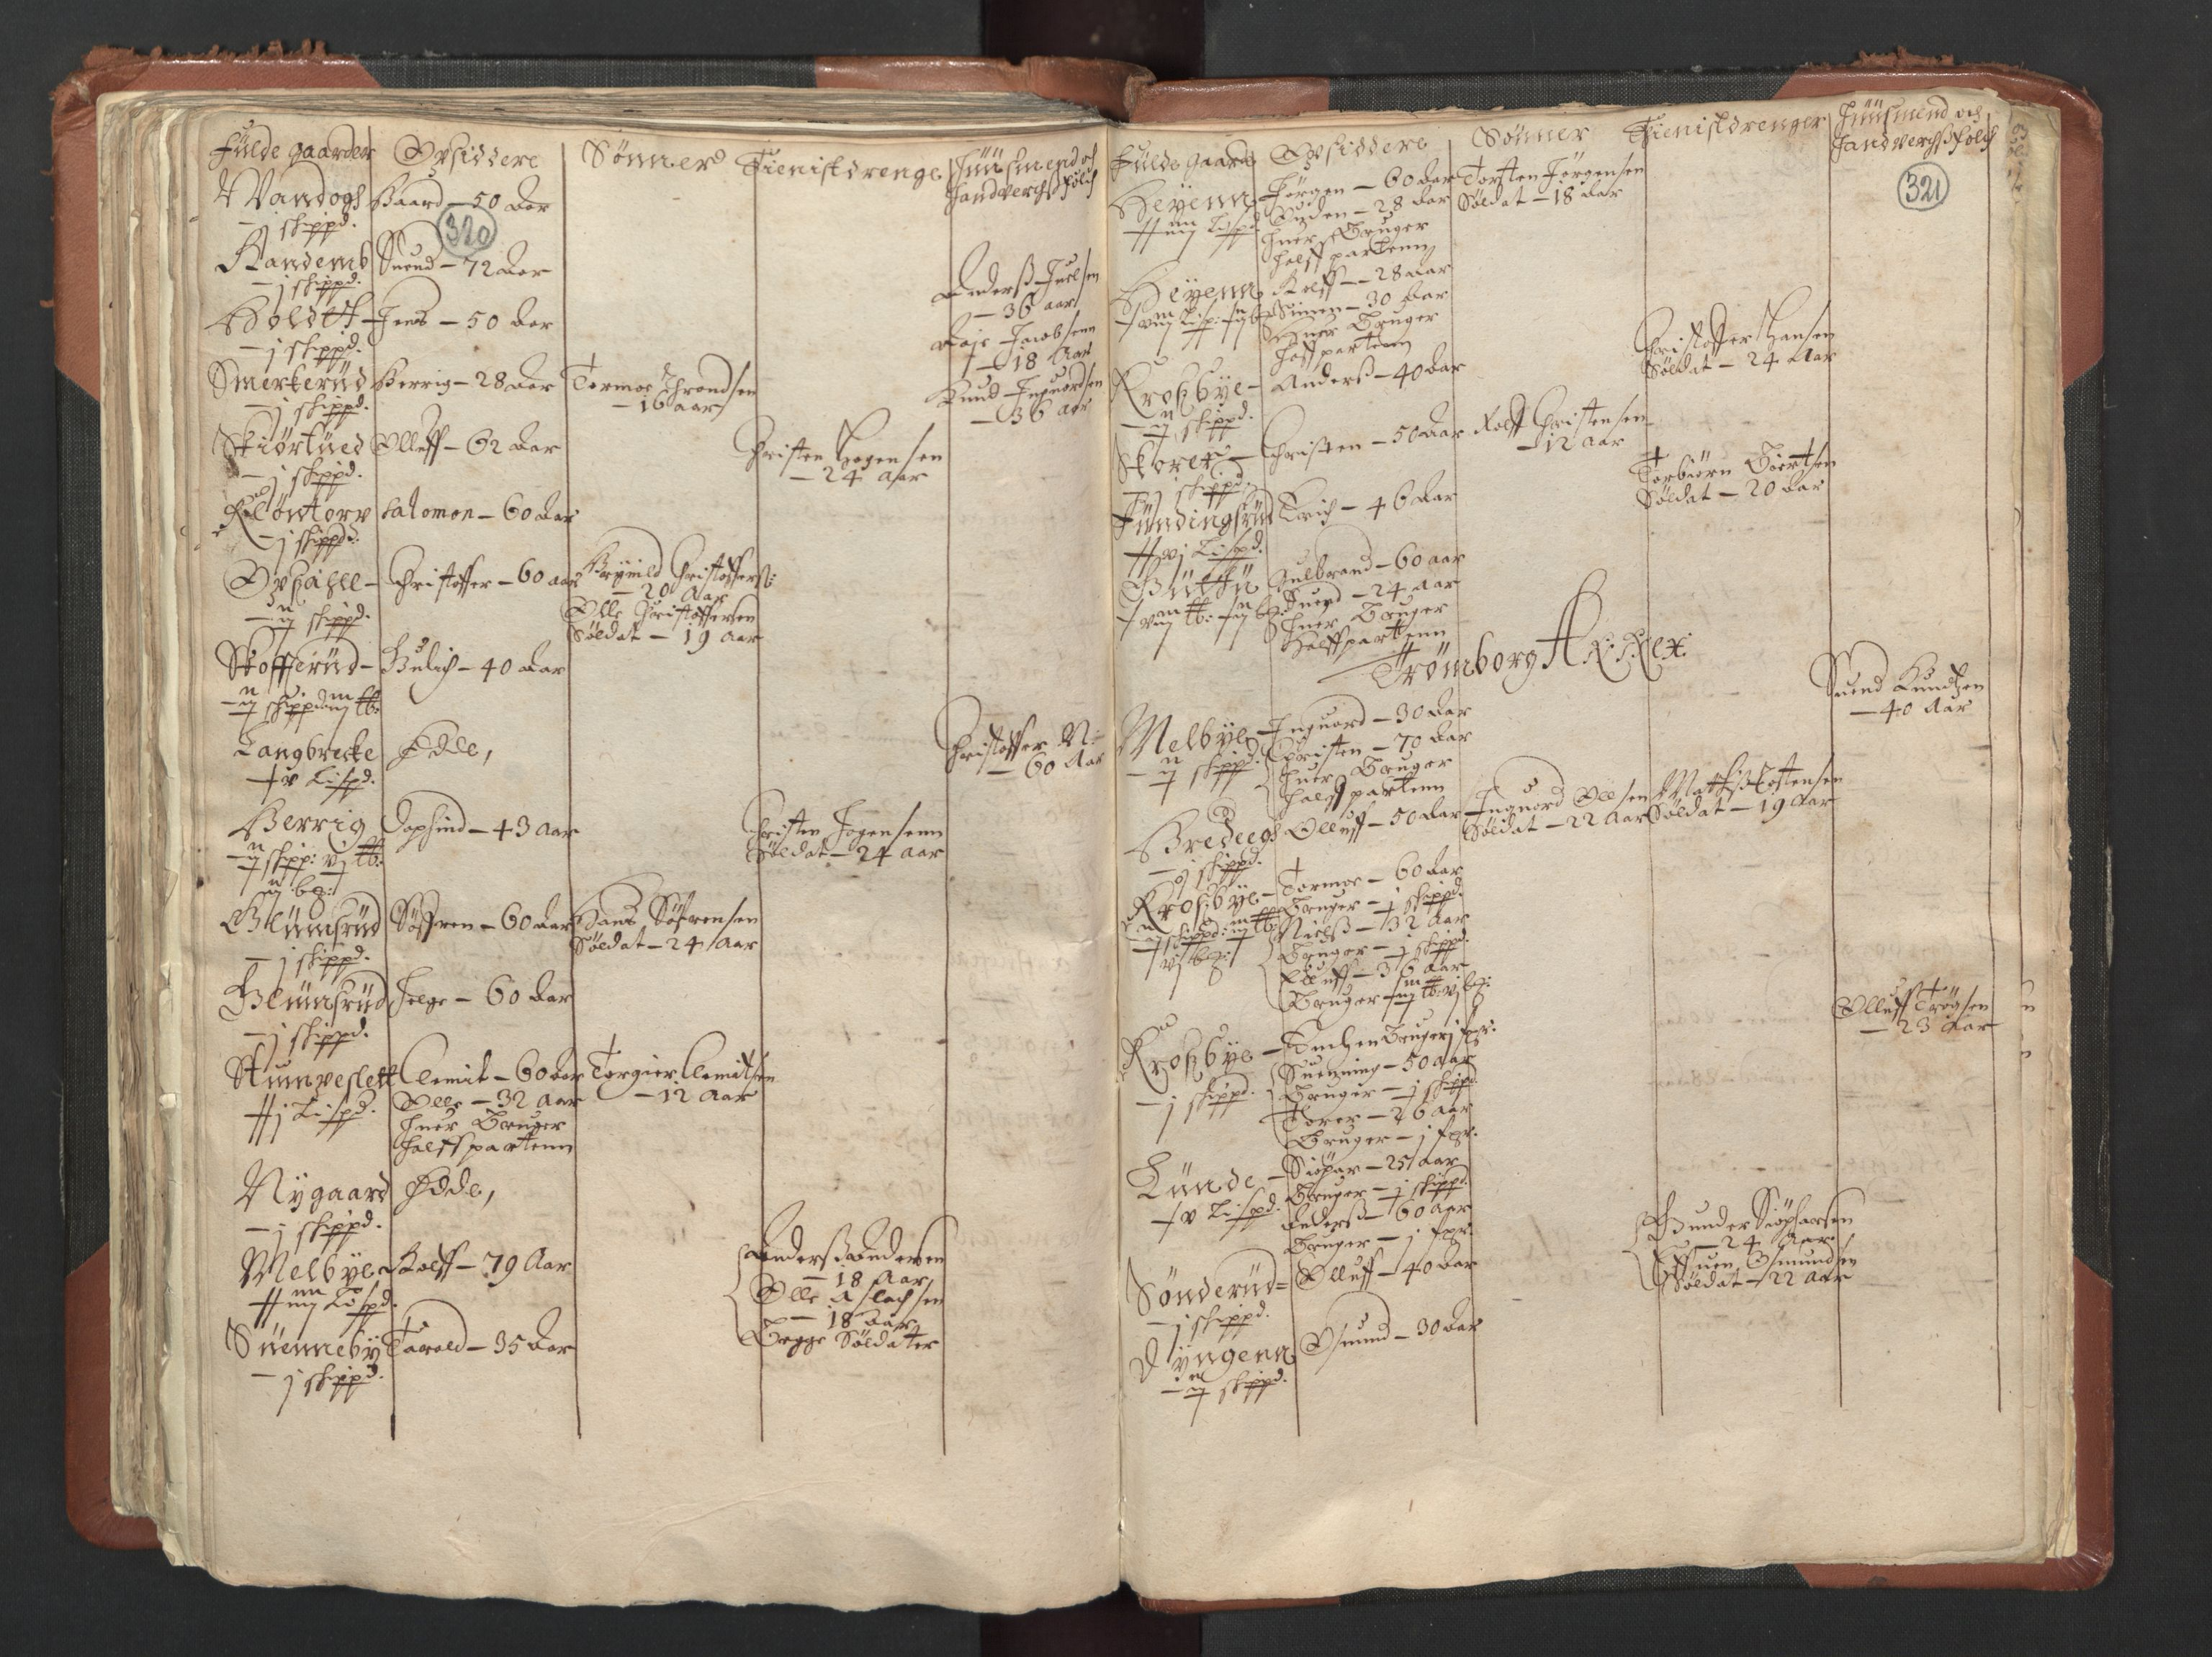 RA, Fogdenes og sorenskrivernes manntall 1664-1666, nr. 1: Fogderier (len og skipreider) i nåværende Østfold fylke, 1664, s. 320-321